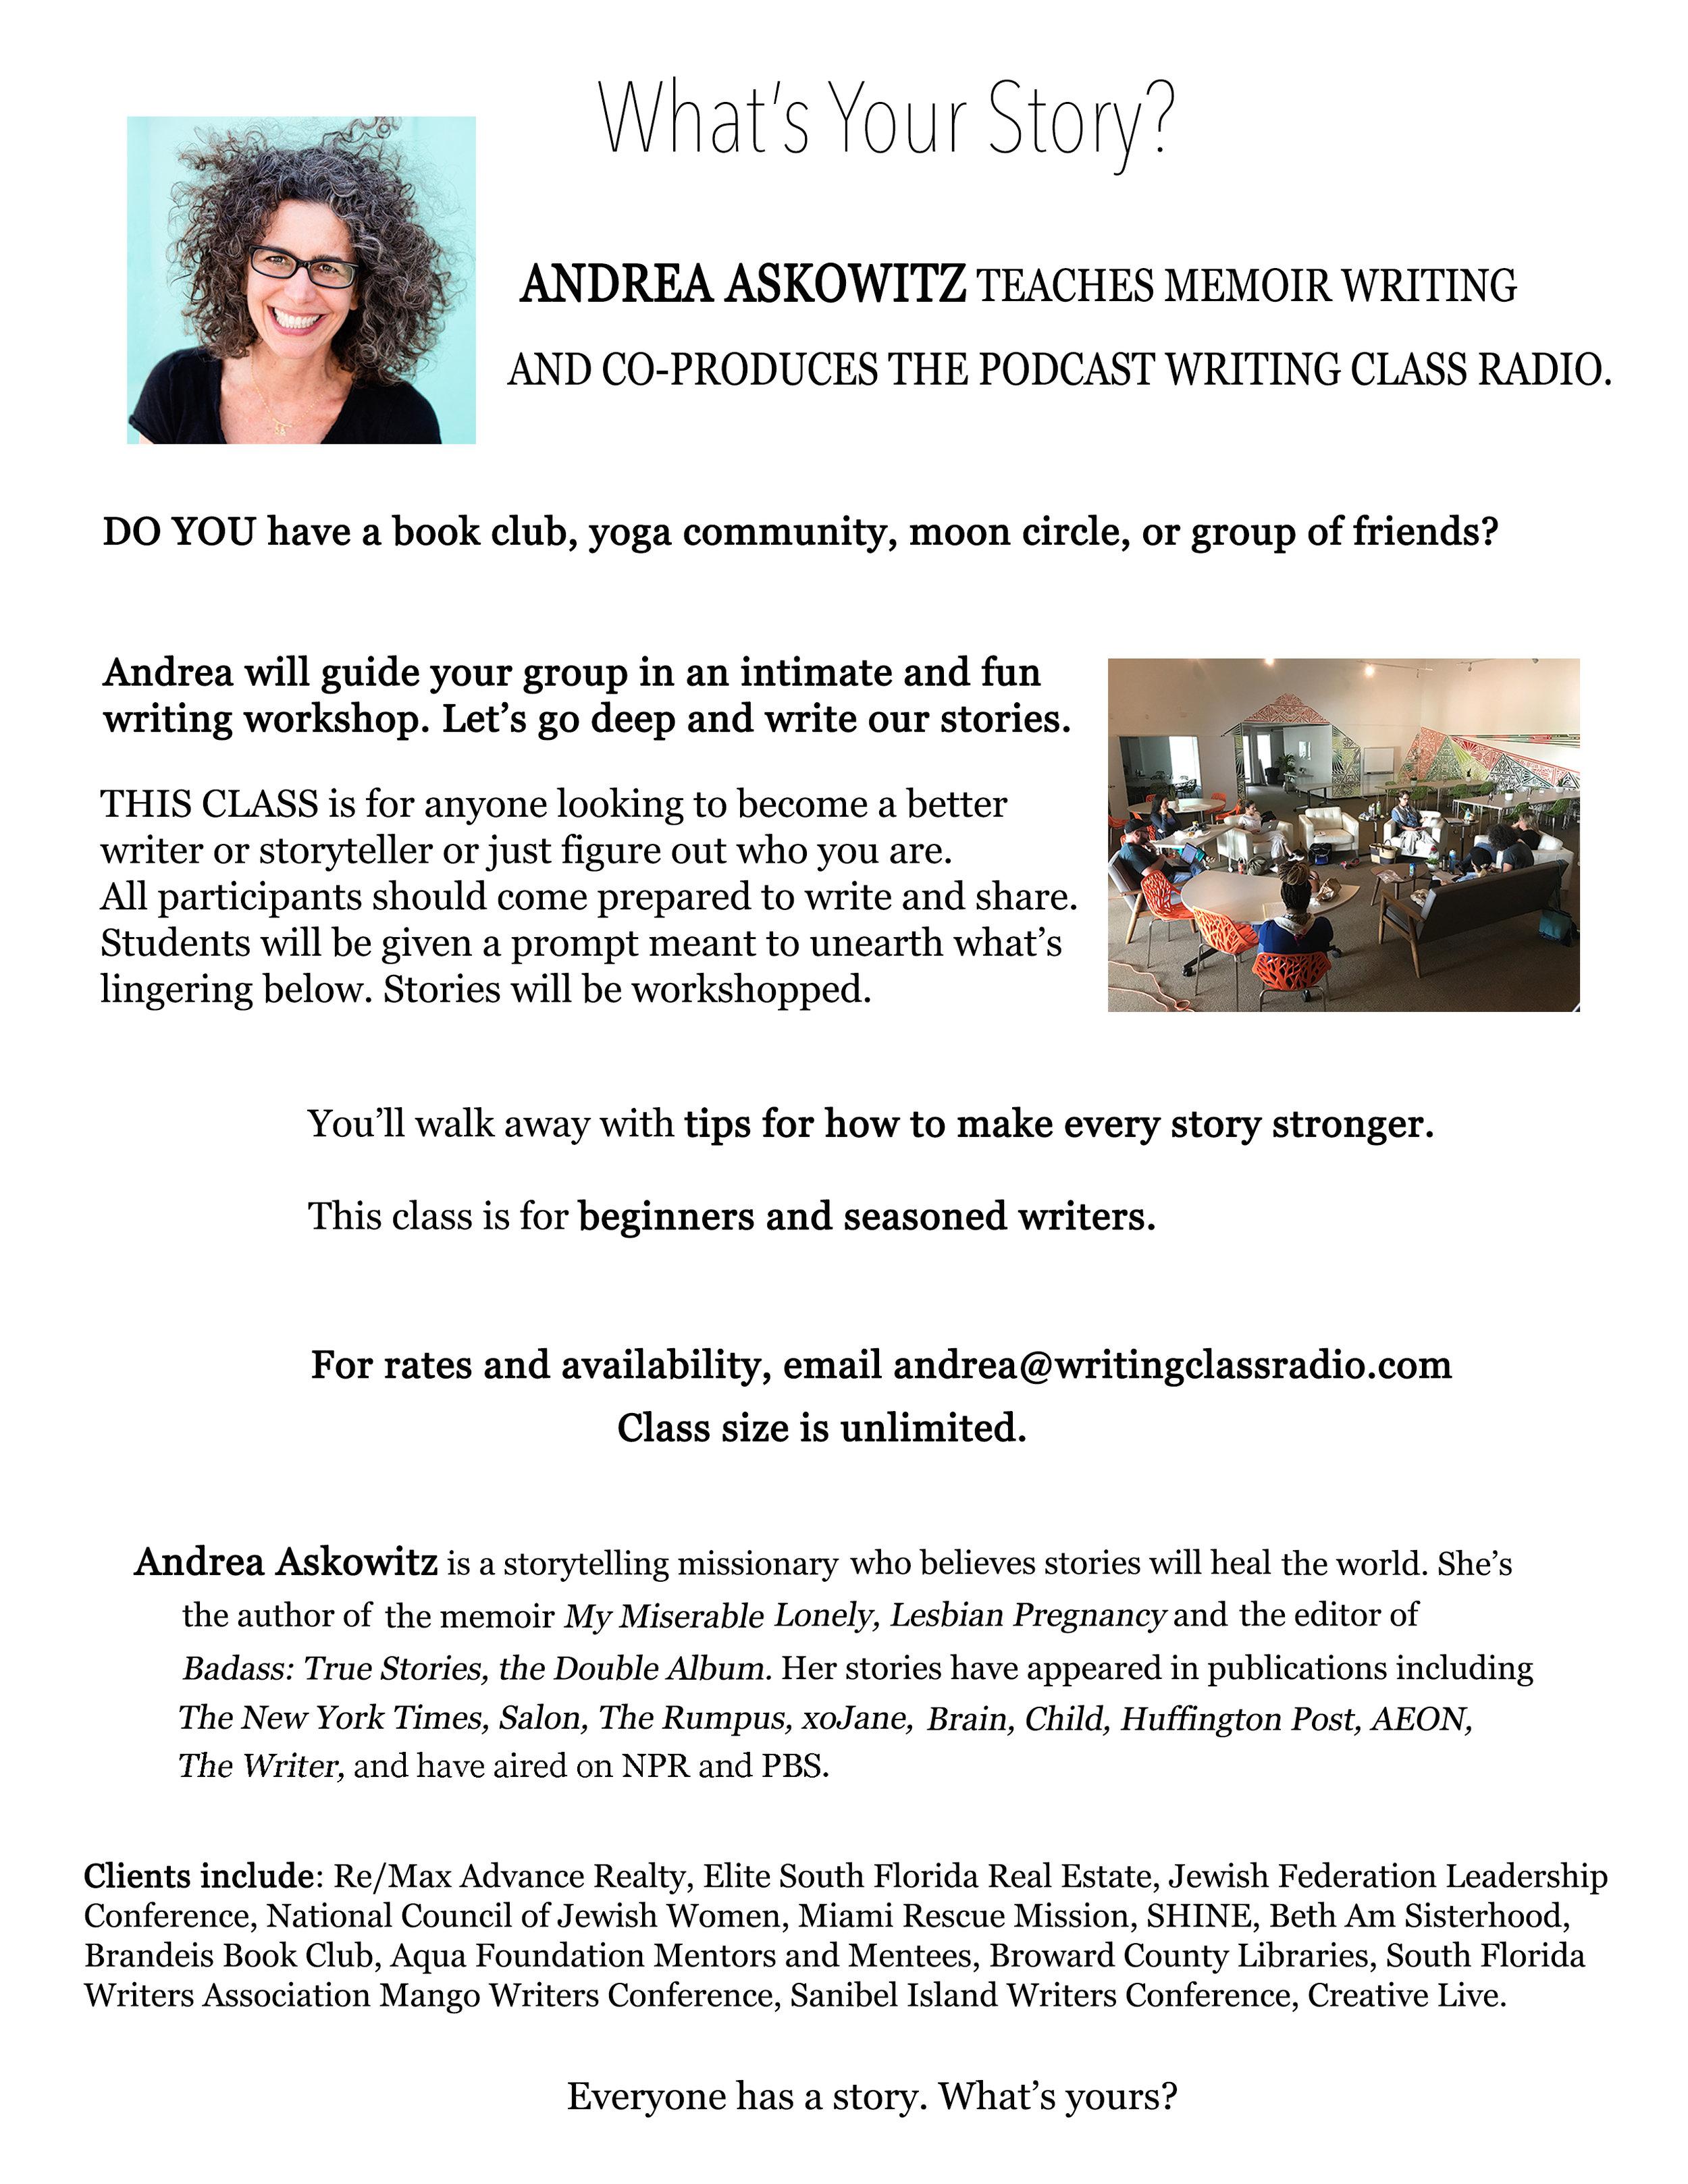 andrea's memoir class one page.jpg